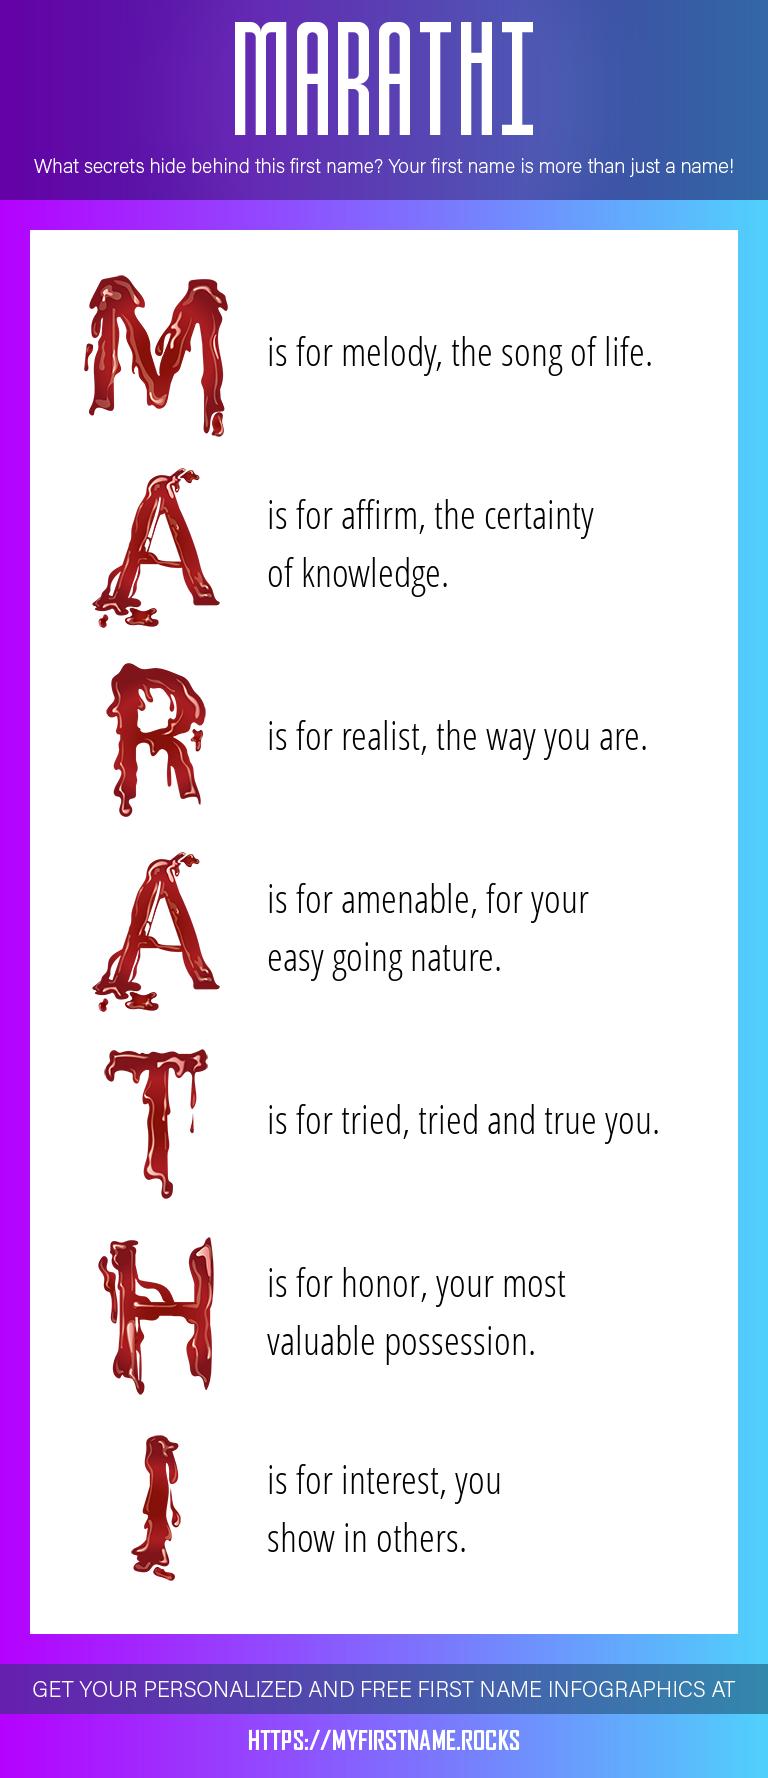 Marathi Infographics